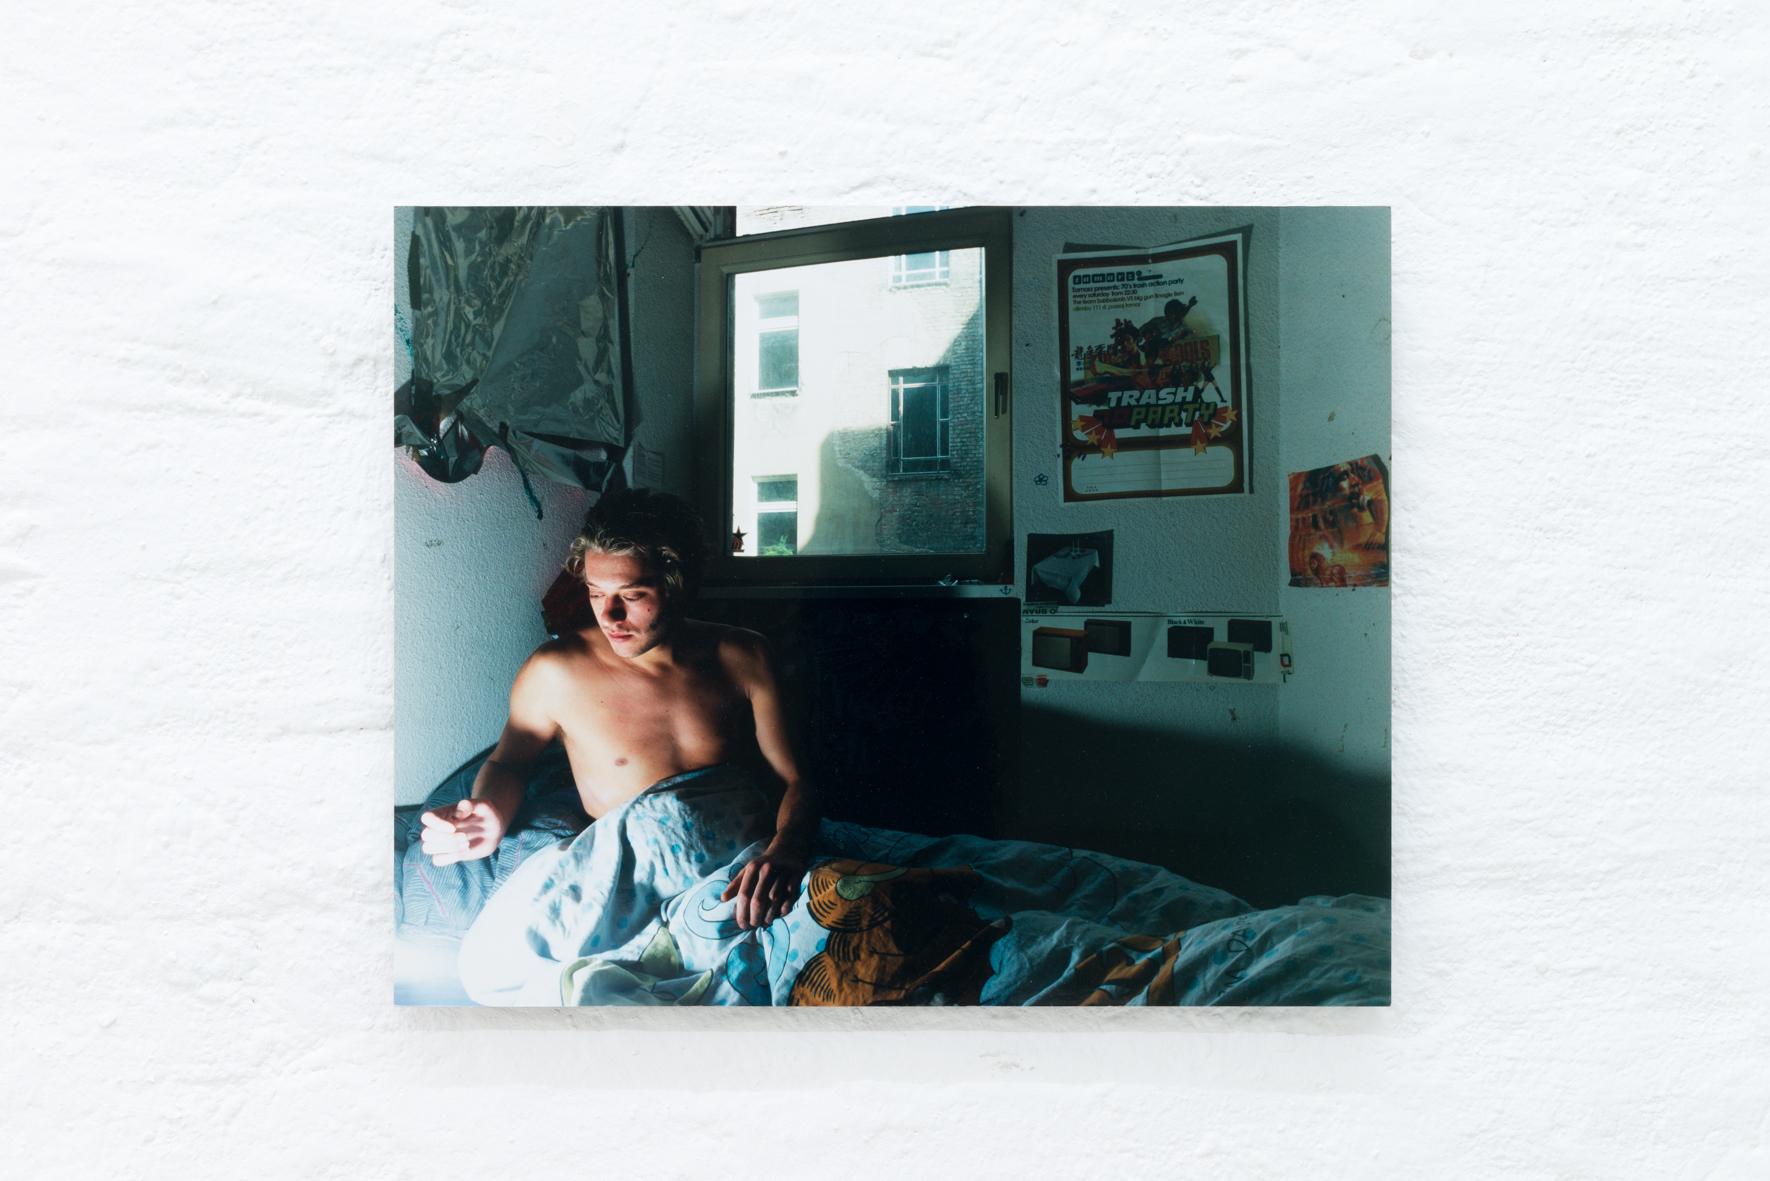 Christian Siekmeier: Untitled (Garfield), 2000; C-type print on steel; 16 x 20 inches